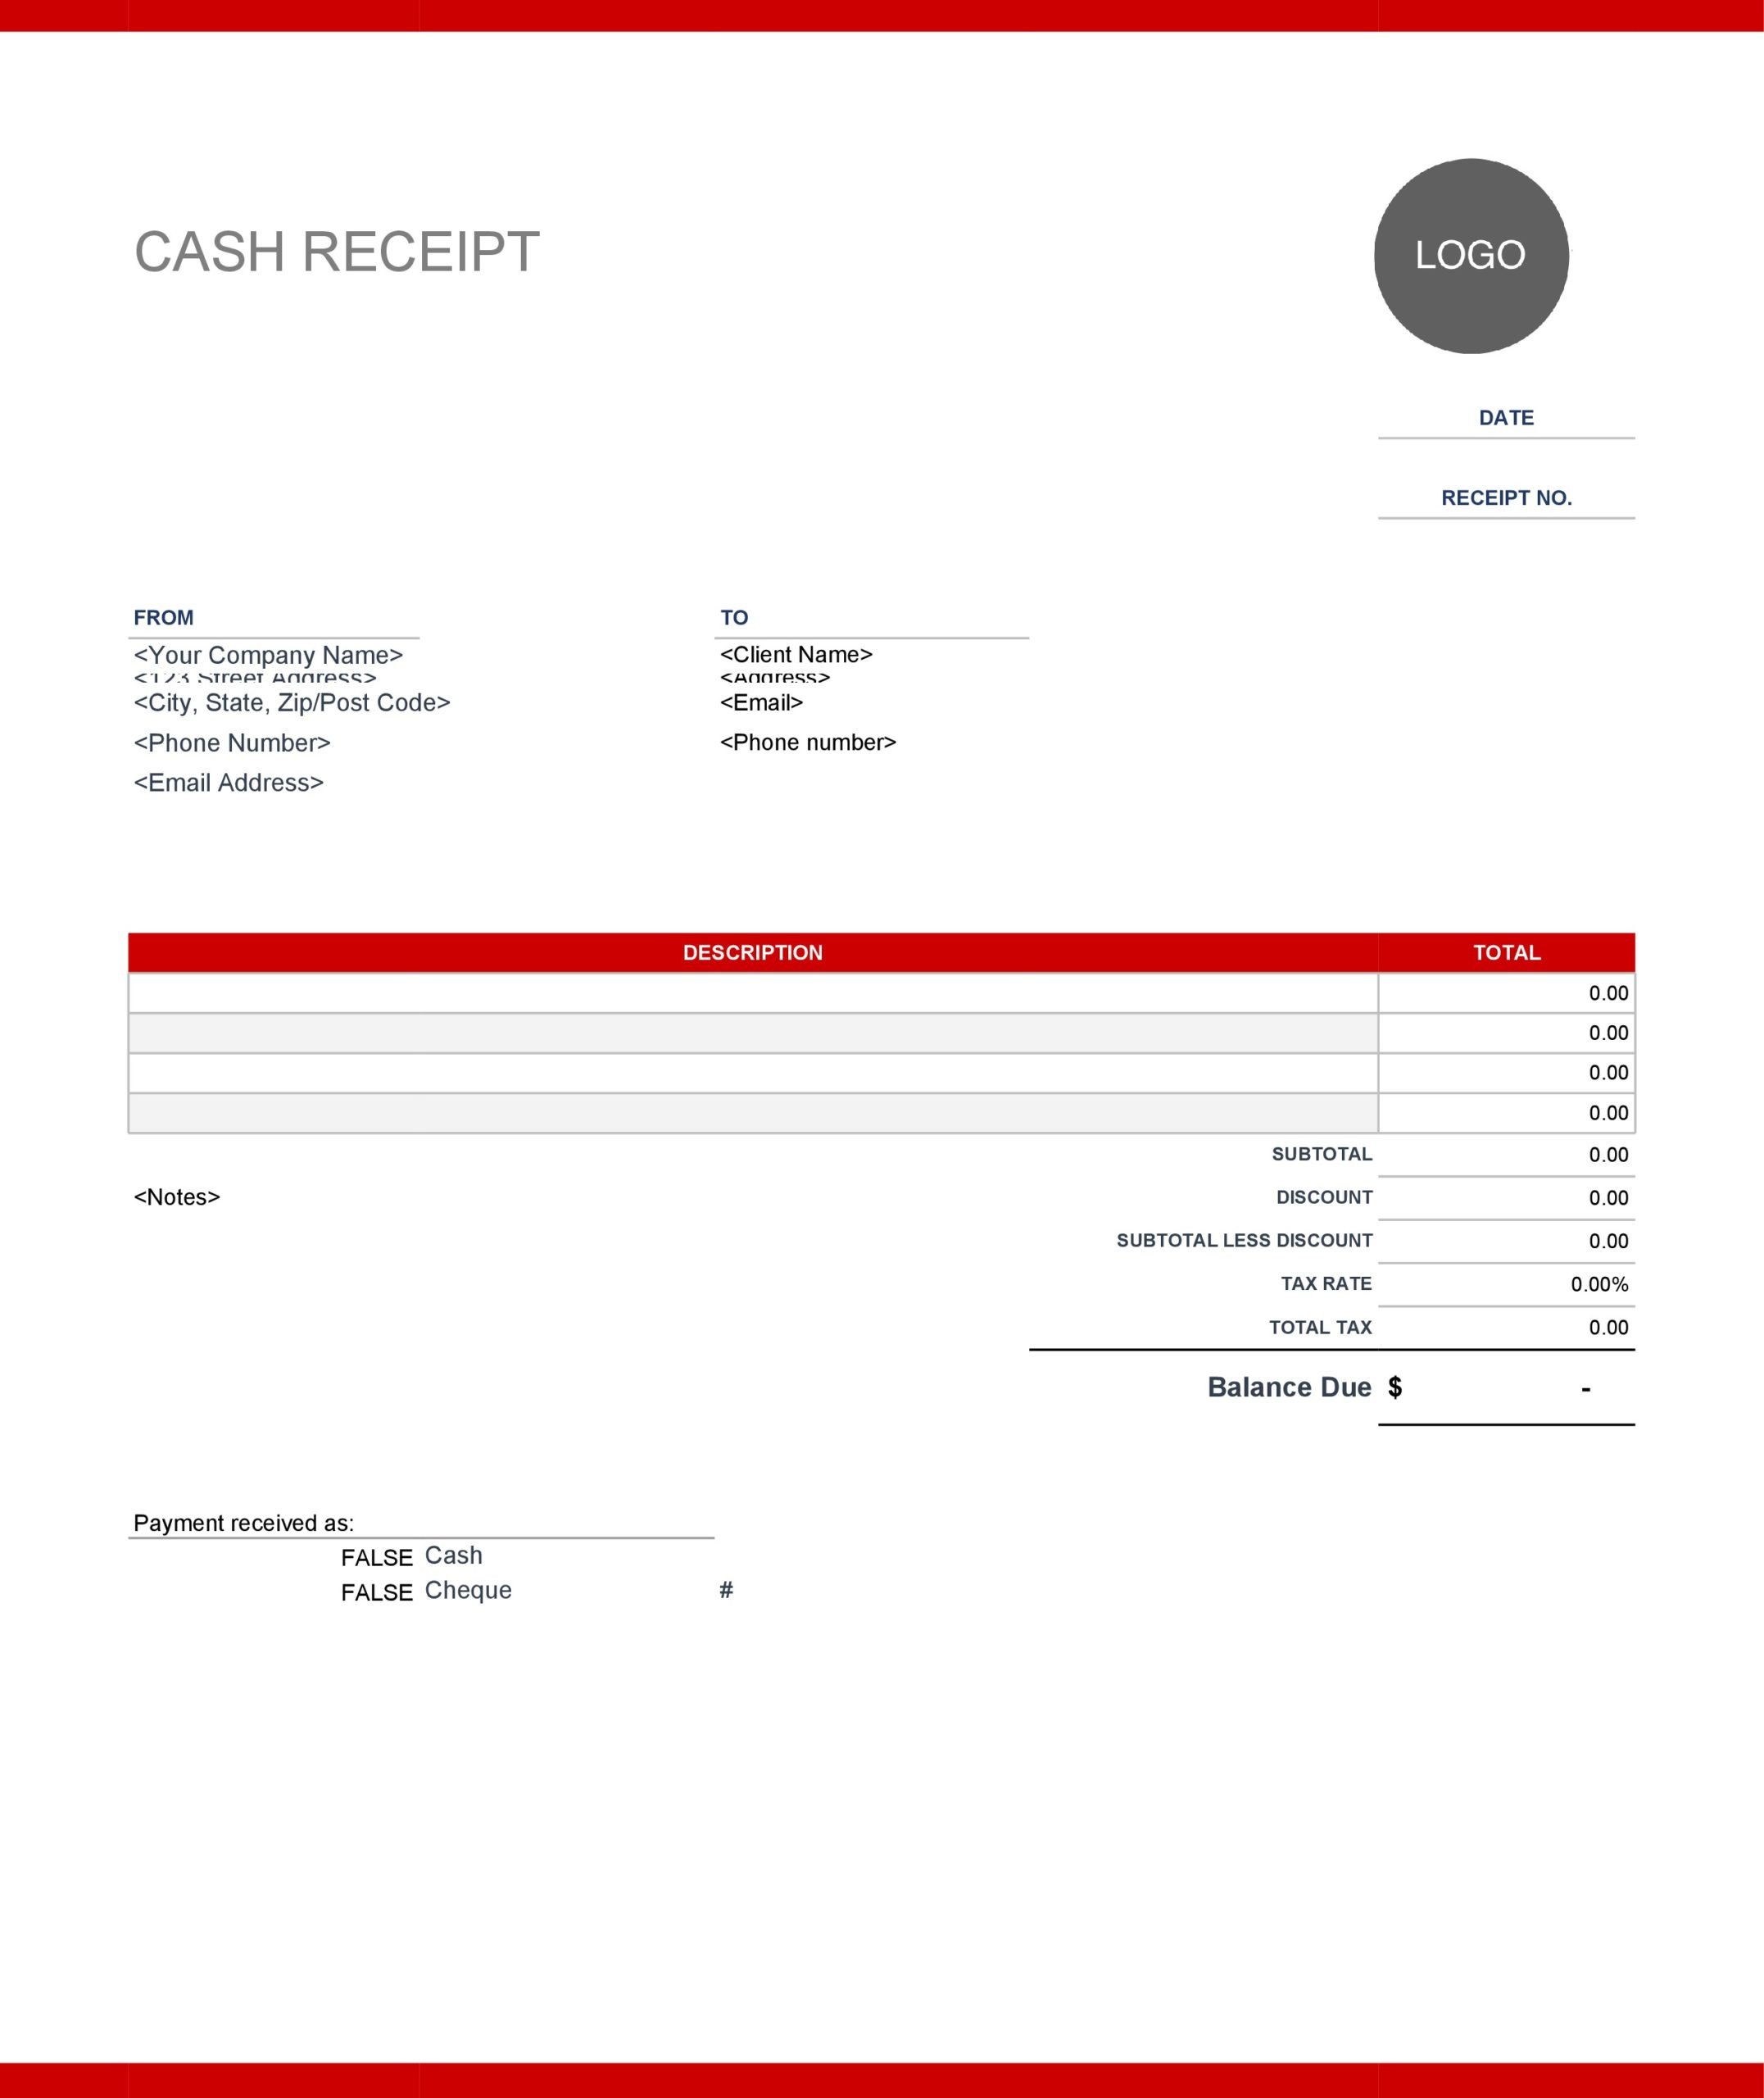 30 Editable Purchase Receipt Templates Word / Excel ᐅ TemplateLab